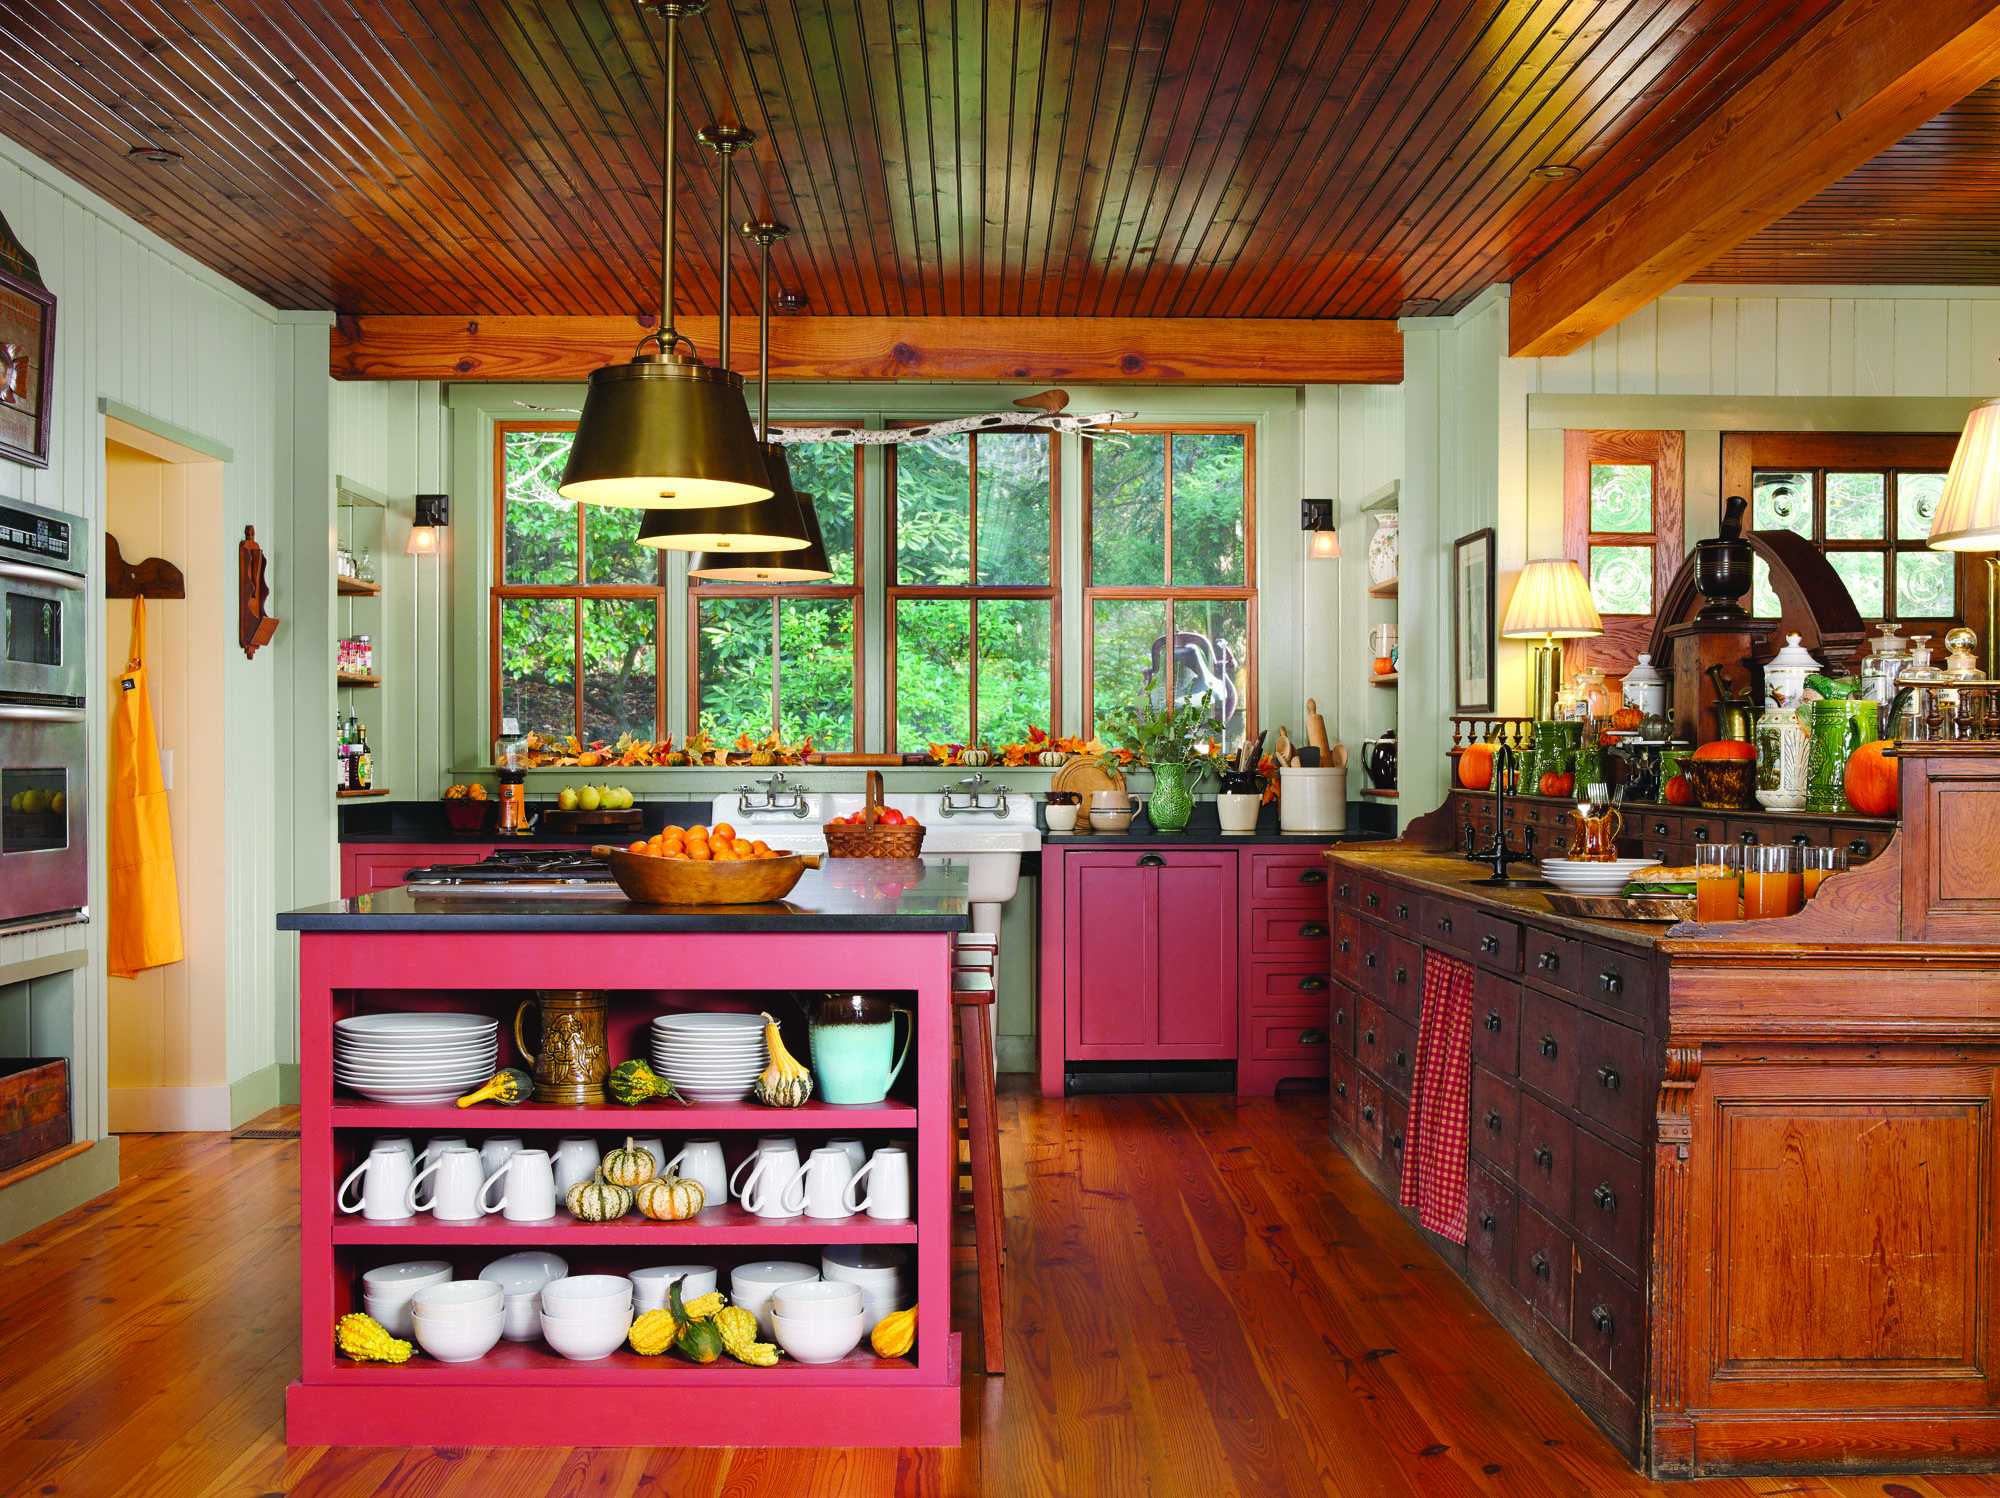 Apothecary Styled Kitchen Renovation